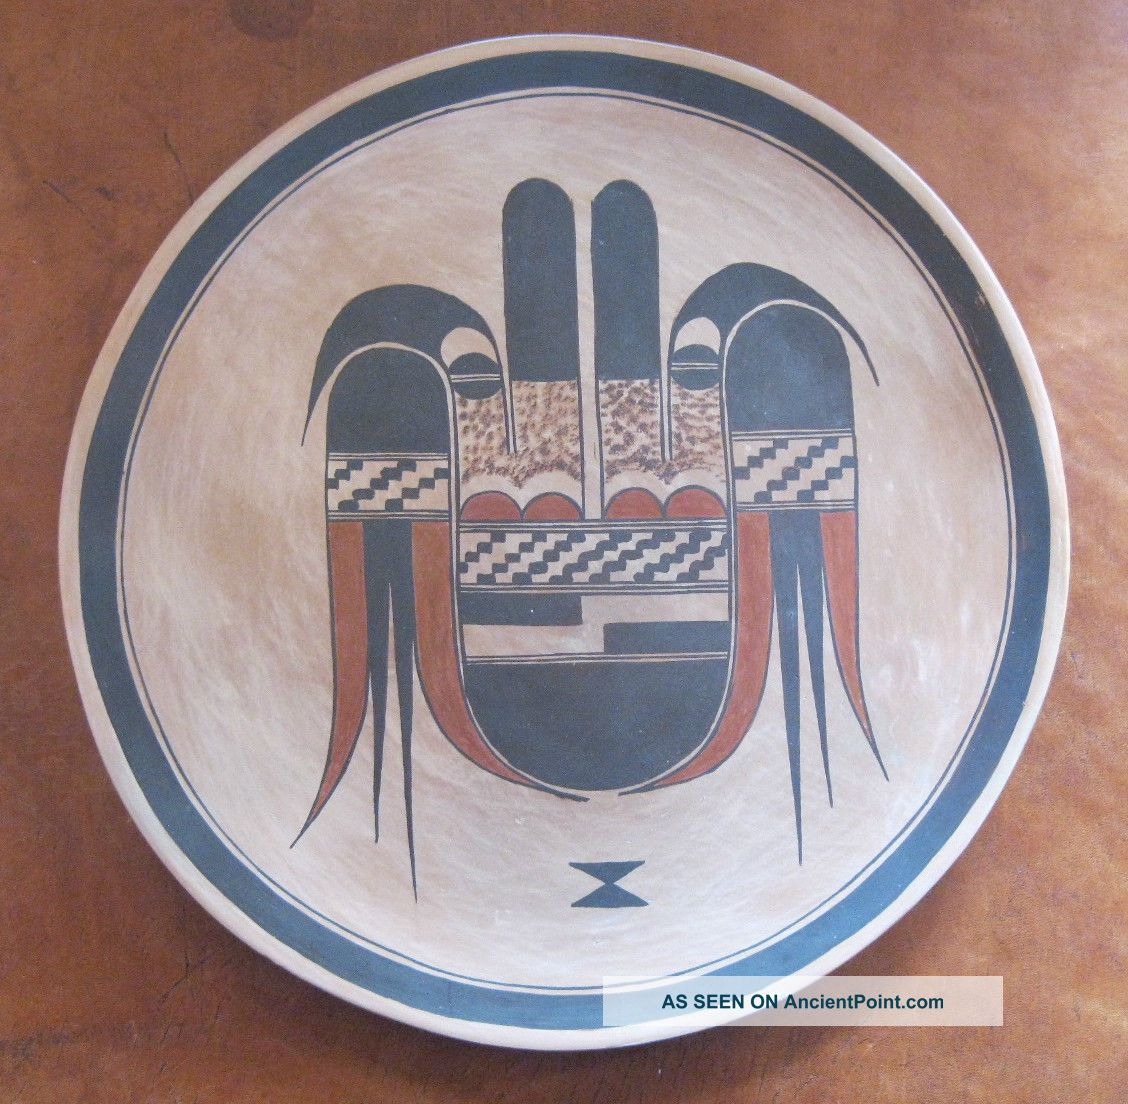 Native American Pottery Hopi Plate By Rachel Sahmie Nampeyo Native American photo